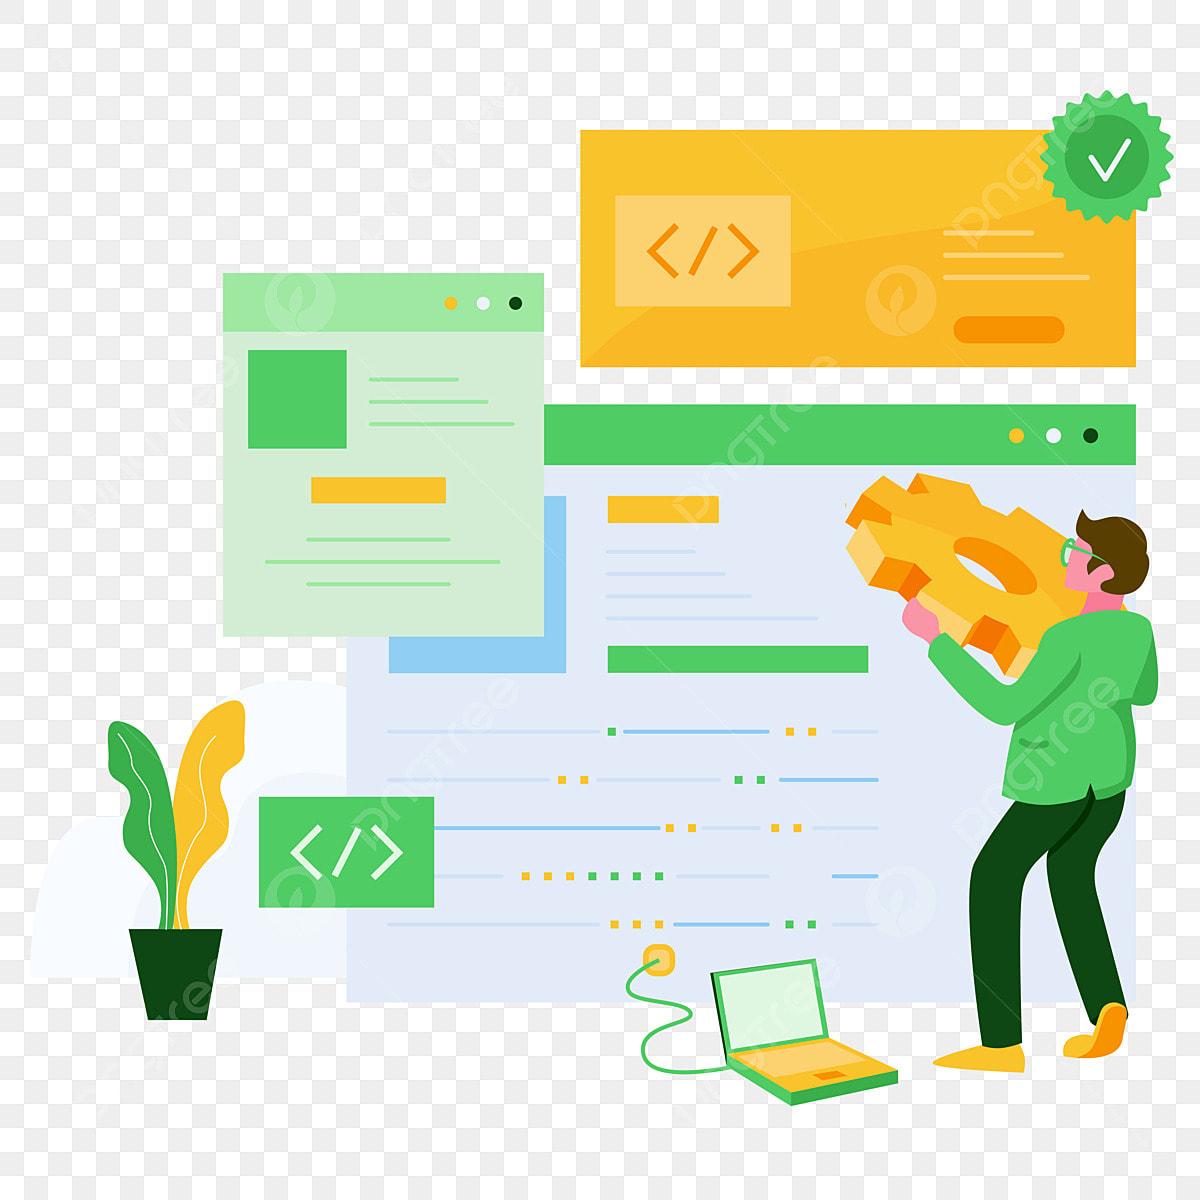 Software Developer Illustration Concept Modern Flat Design Concept Of Web Page Design For Website And Mobile Website Vector Illustration Software Web Coding Png And Vector With Transparent Background For Free Download